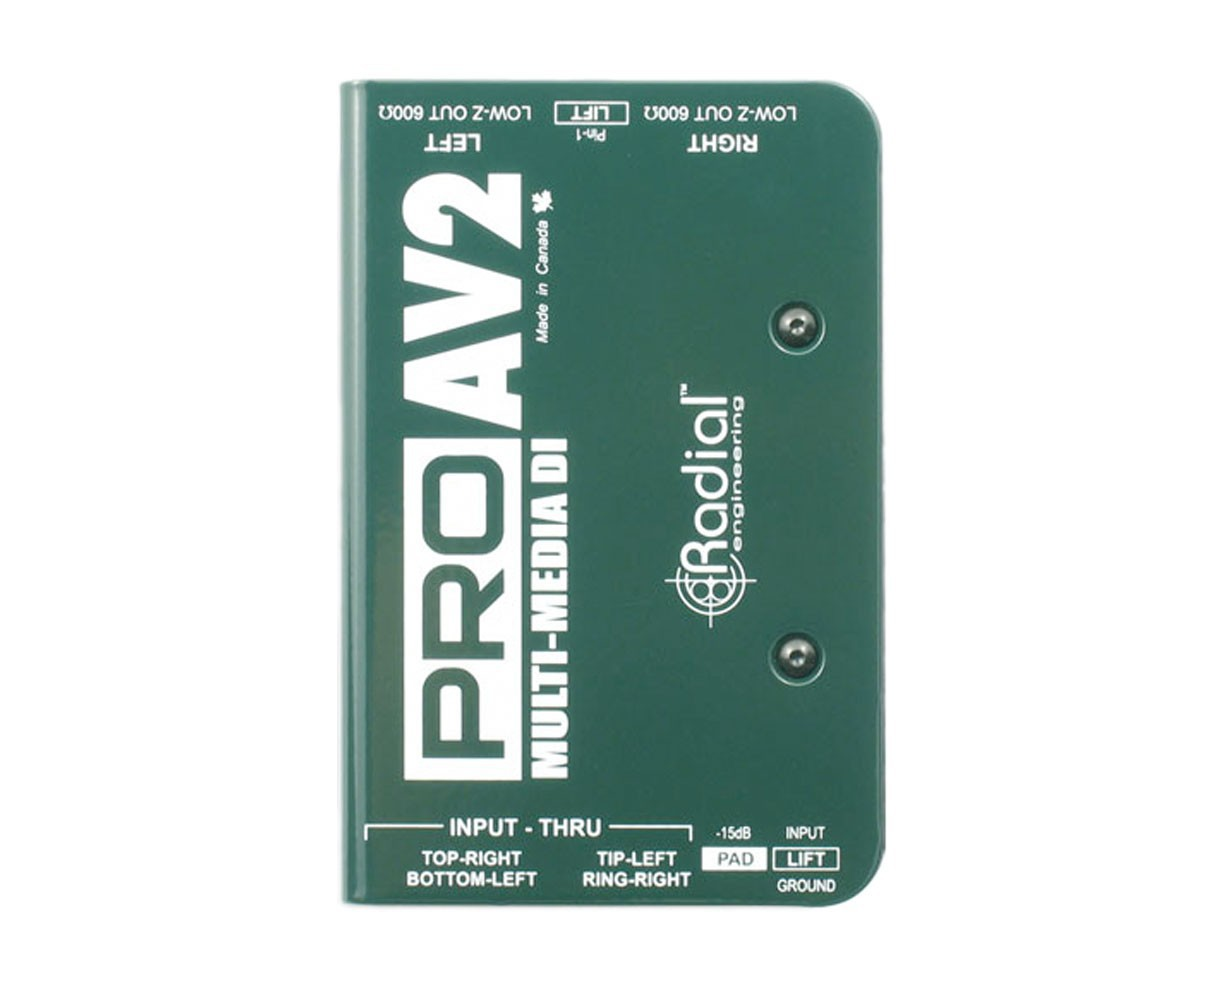 Radial Pro AV2 Passiv Multimedia DI Box 2 Channel